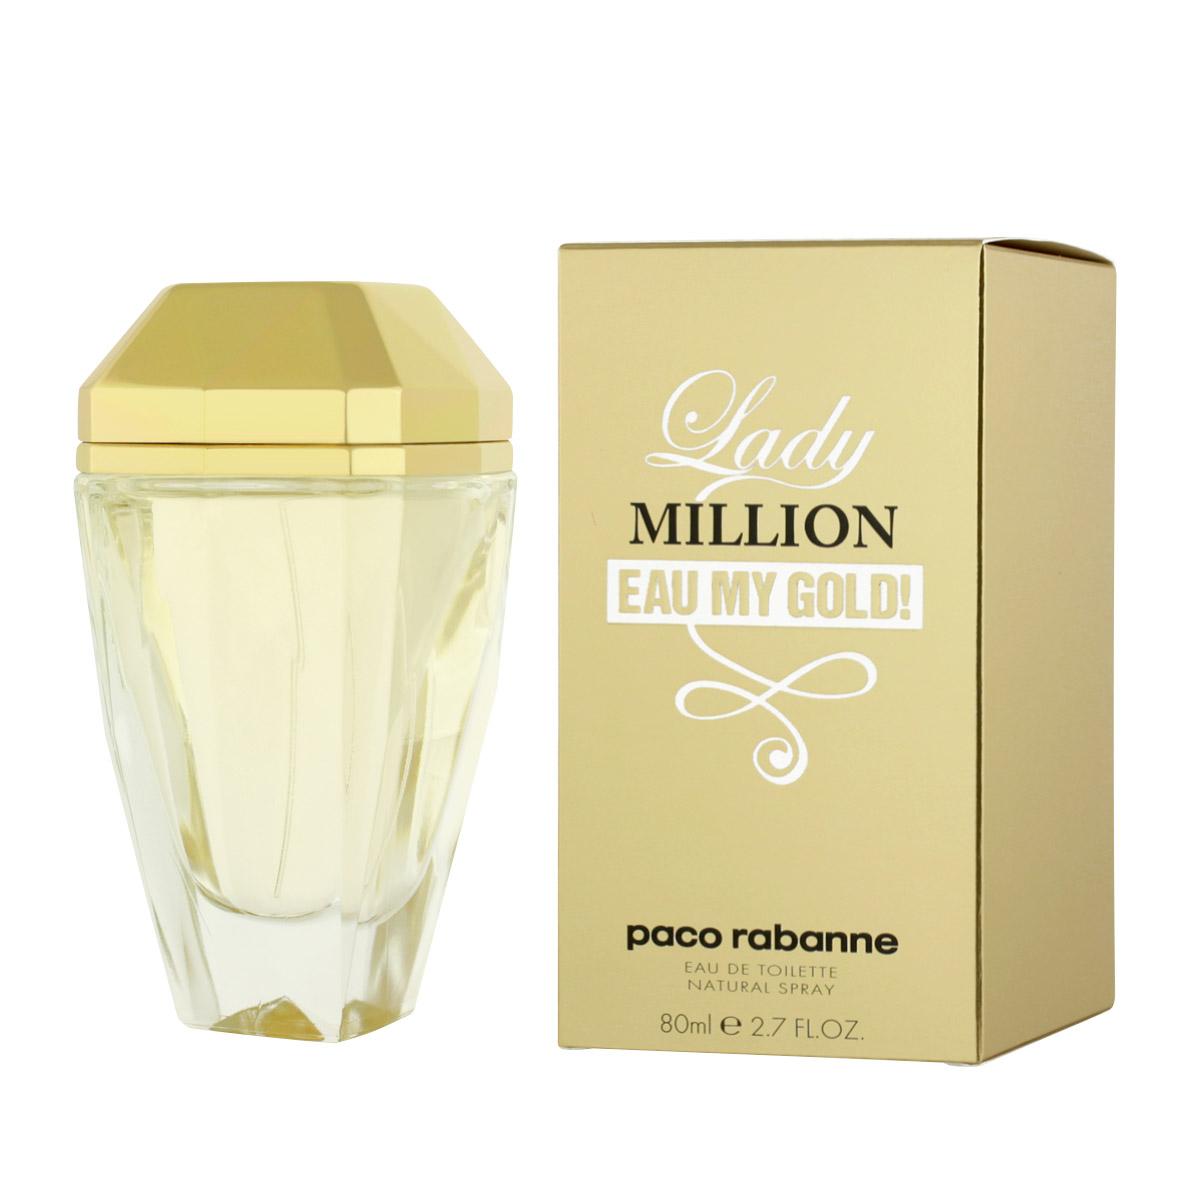 Paco Rabanne Lady Million Eau My Gold! EDT 80 ml W